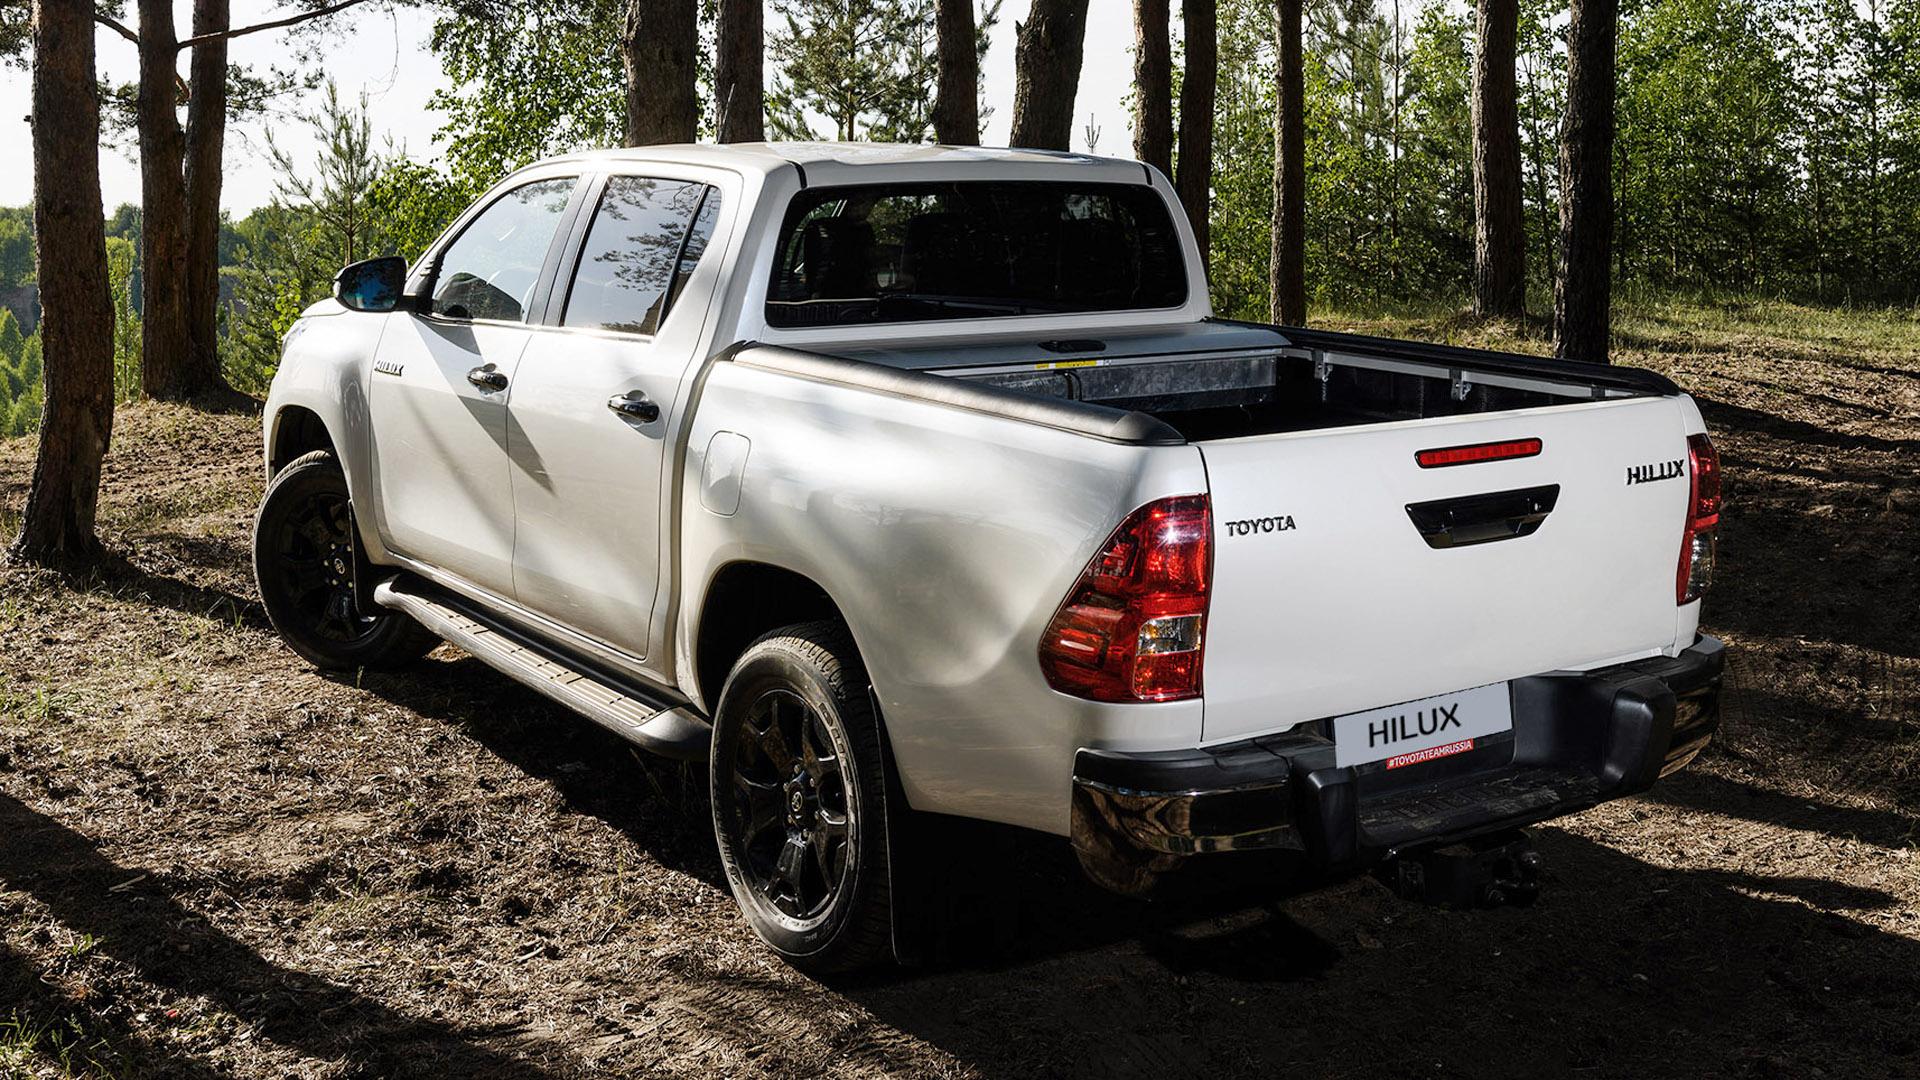 Toyota Hilux Exlusive Black